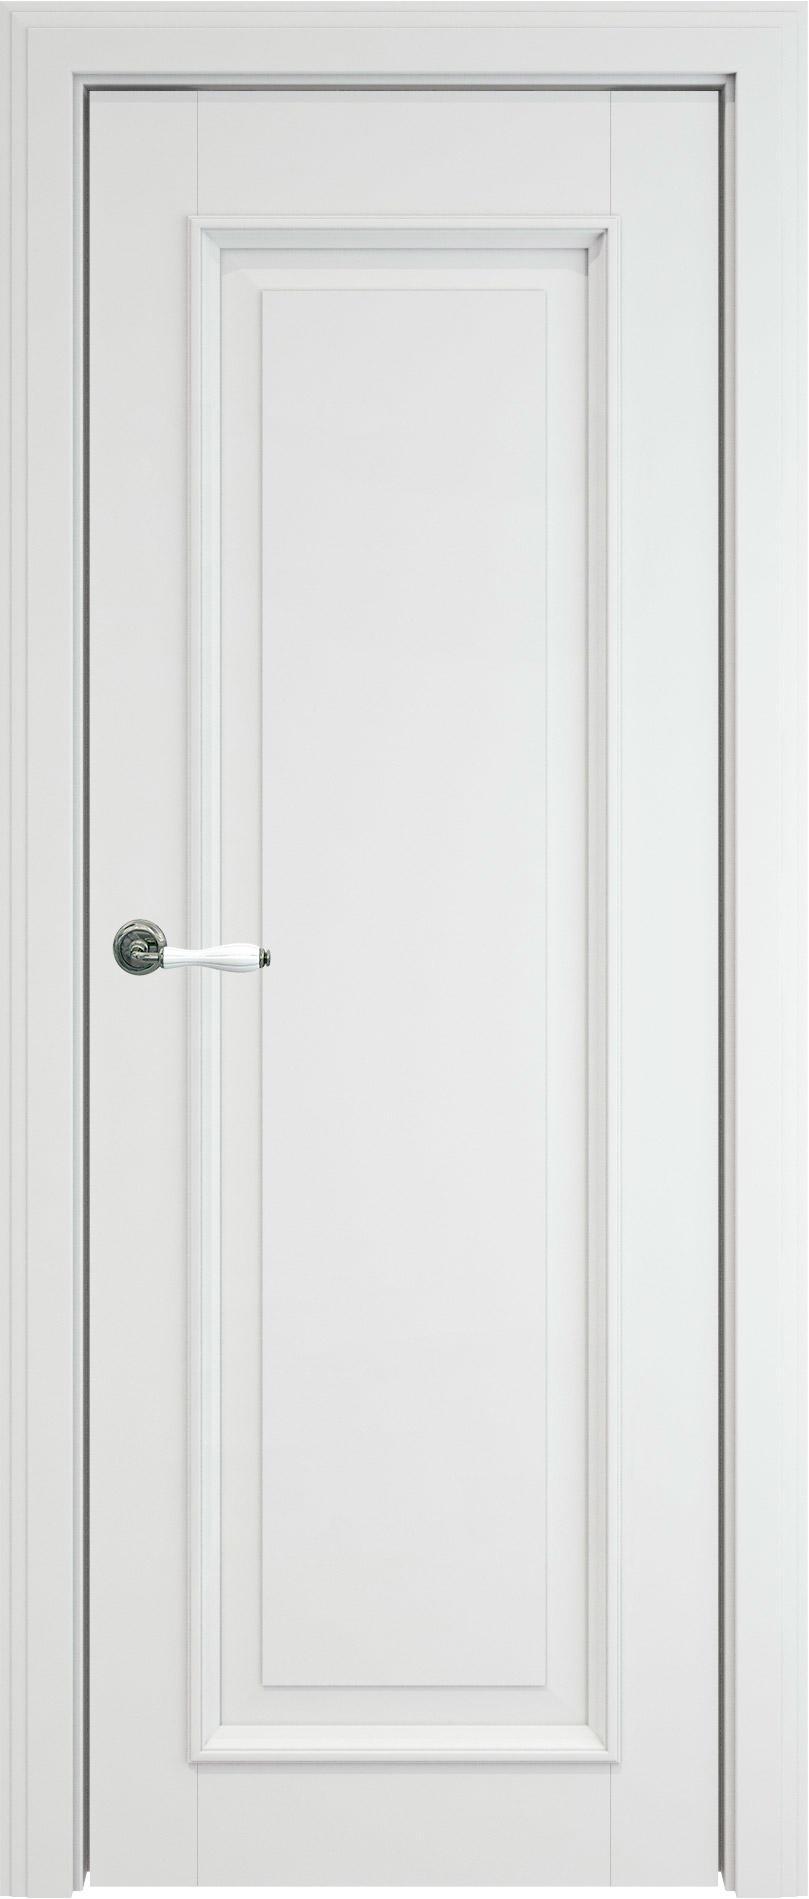 Domenica LUX цвет - Бежевая эмаль (RAL 9010) Без стекла (ДГ)